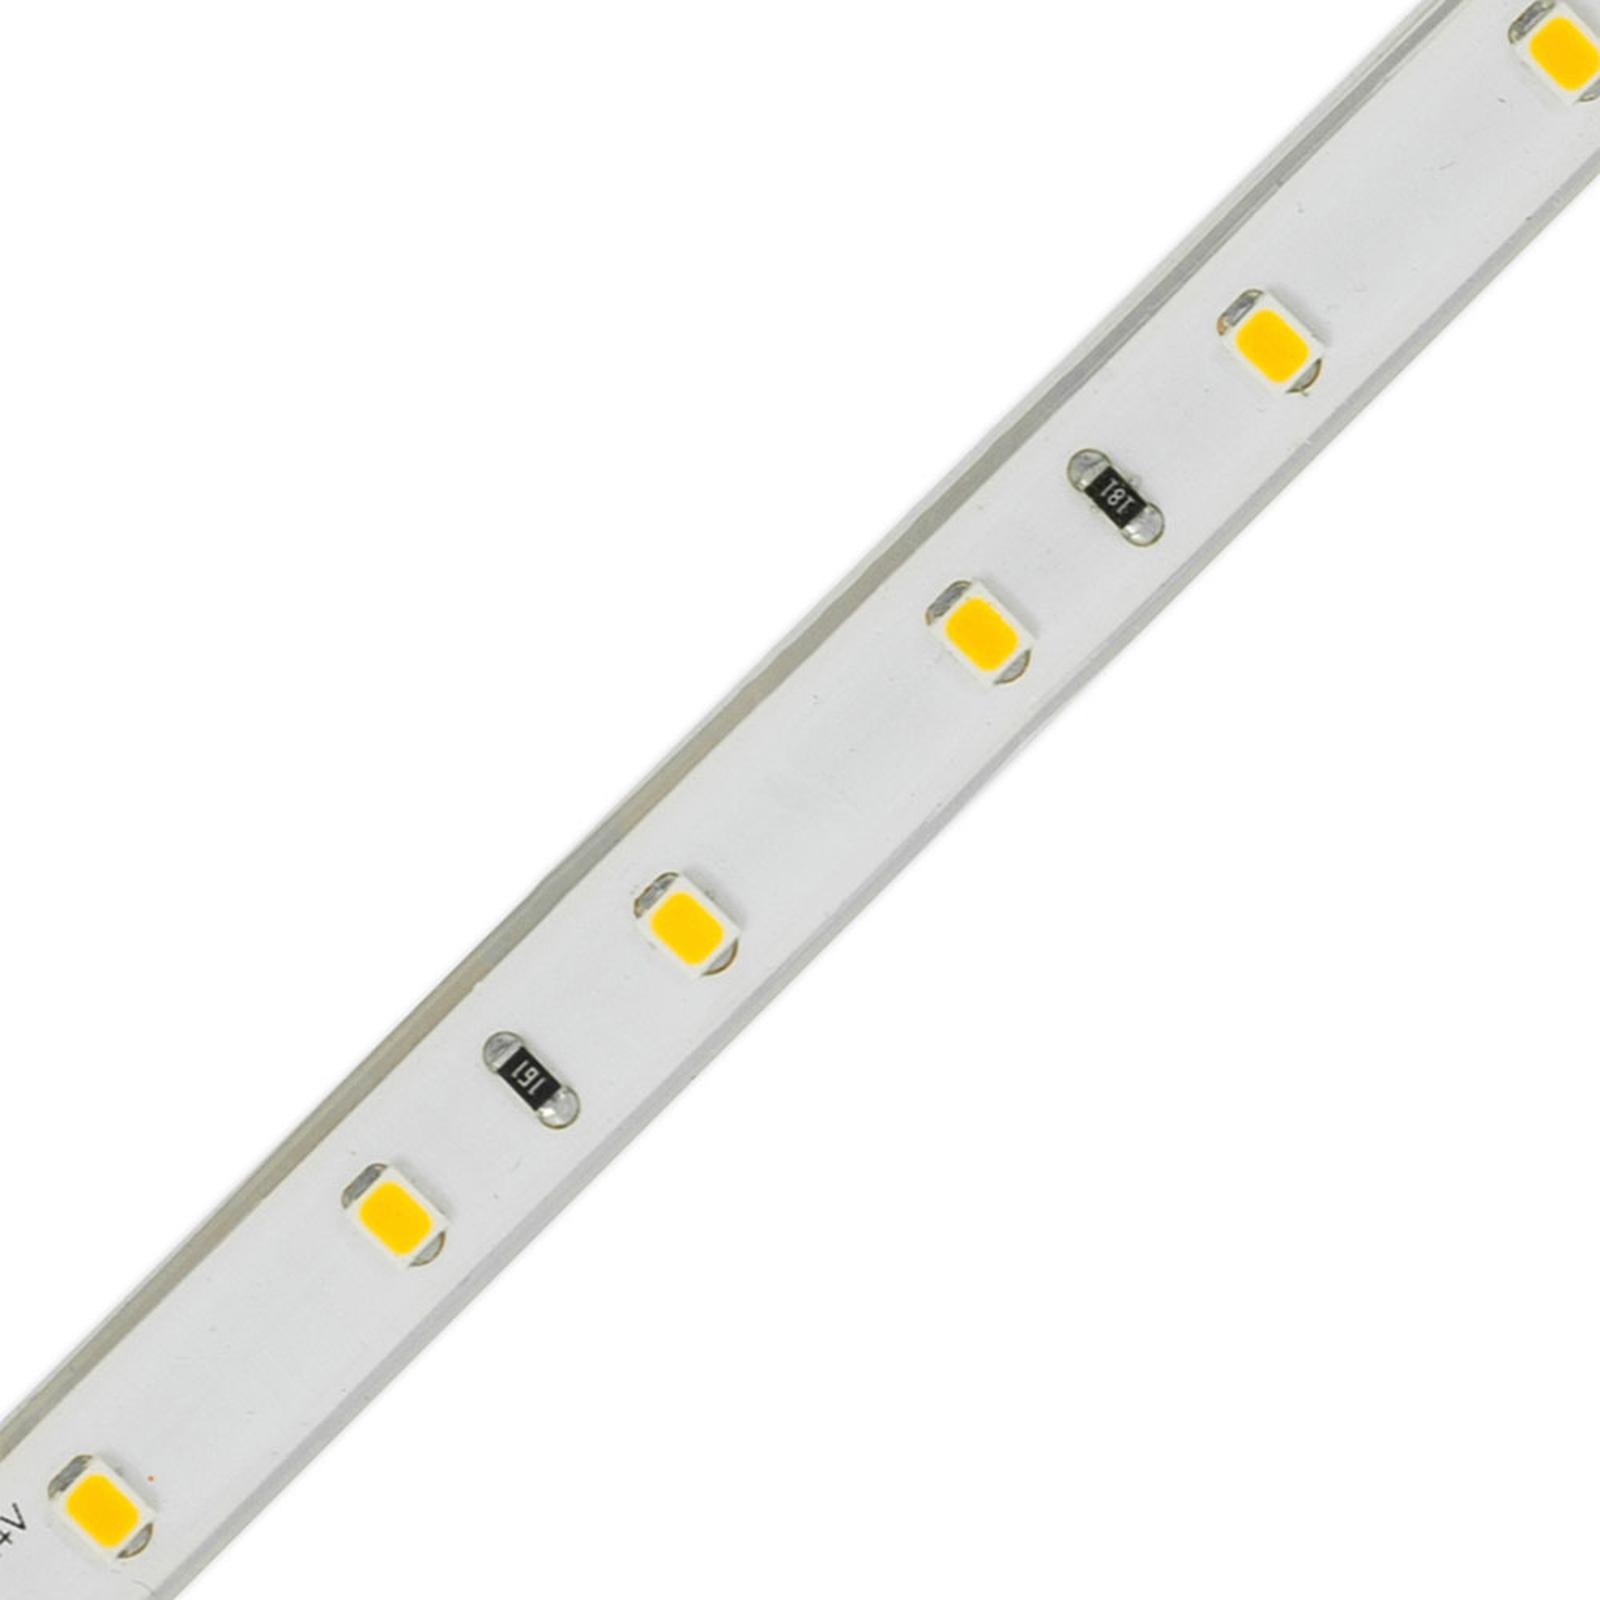 EVN STR6724 LED-list IP67 5 m 24 W 2700K